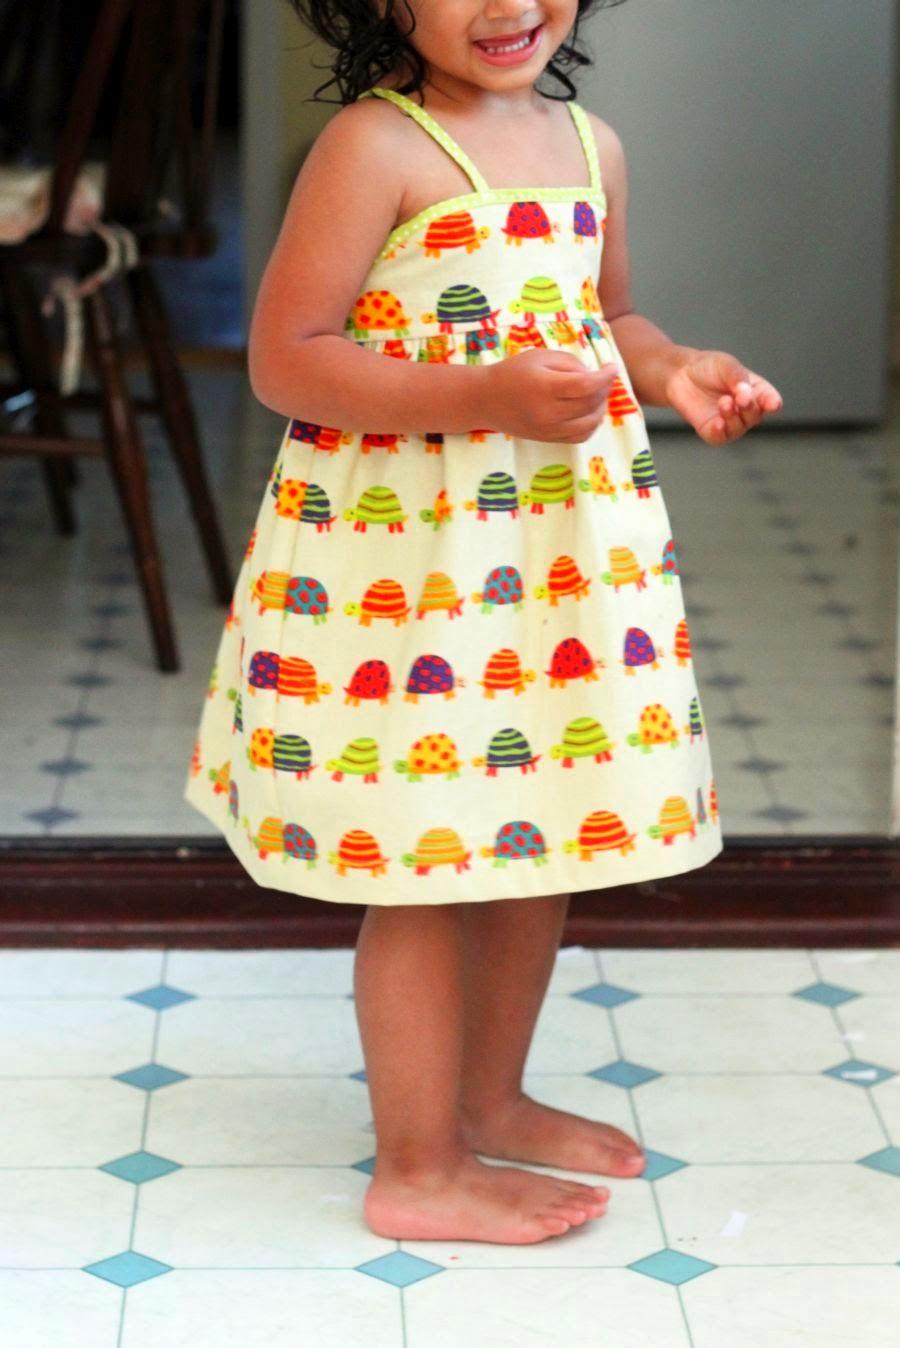 http://widicreations.blogspot.co.uk/2014/07/summer-dress-pattern-variation.html